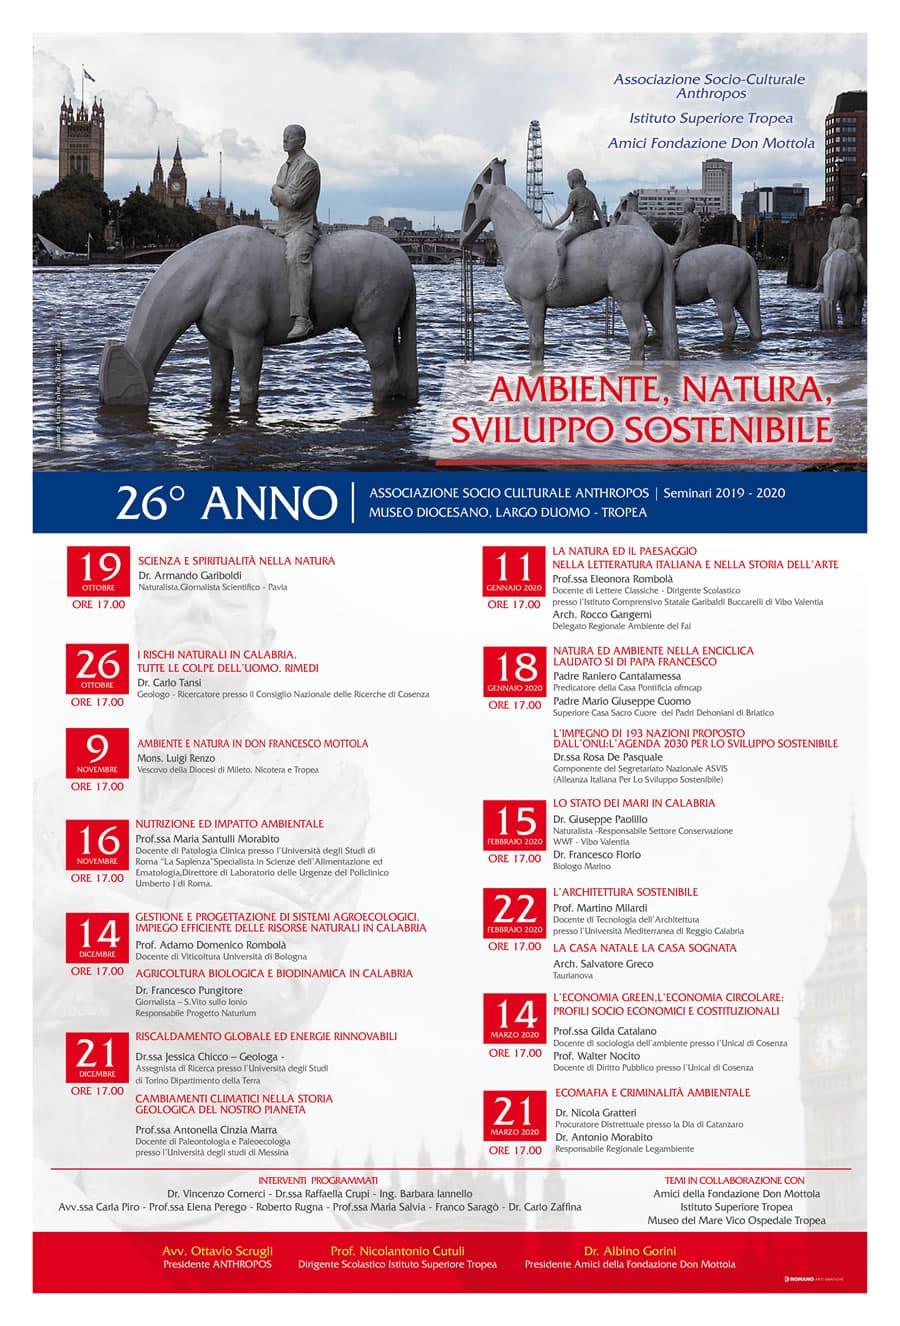 Programma seminari Associazione Anthropos Tropea 2019 - 2020 locandina